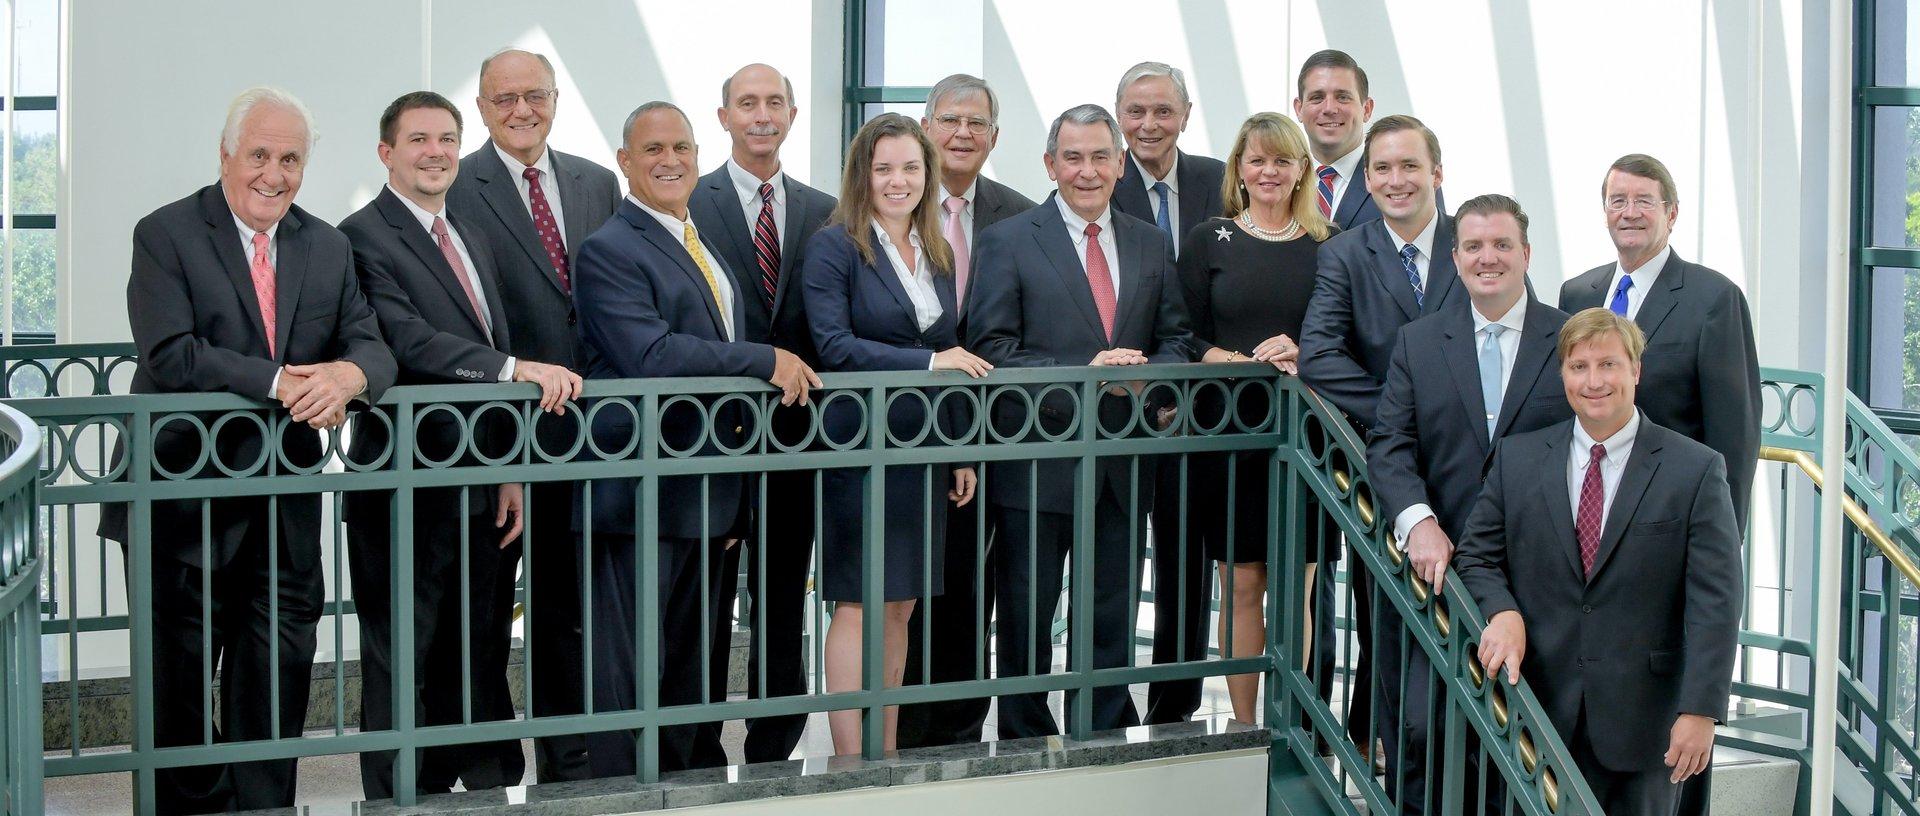 Full Service Law Firm Serving Vero Beach, FL